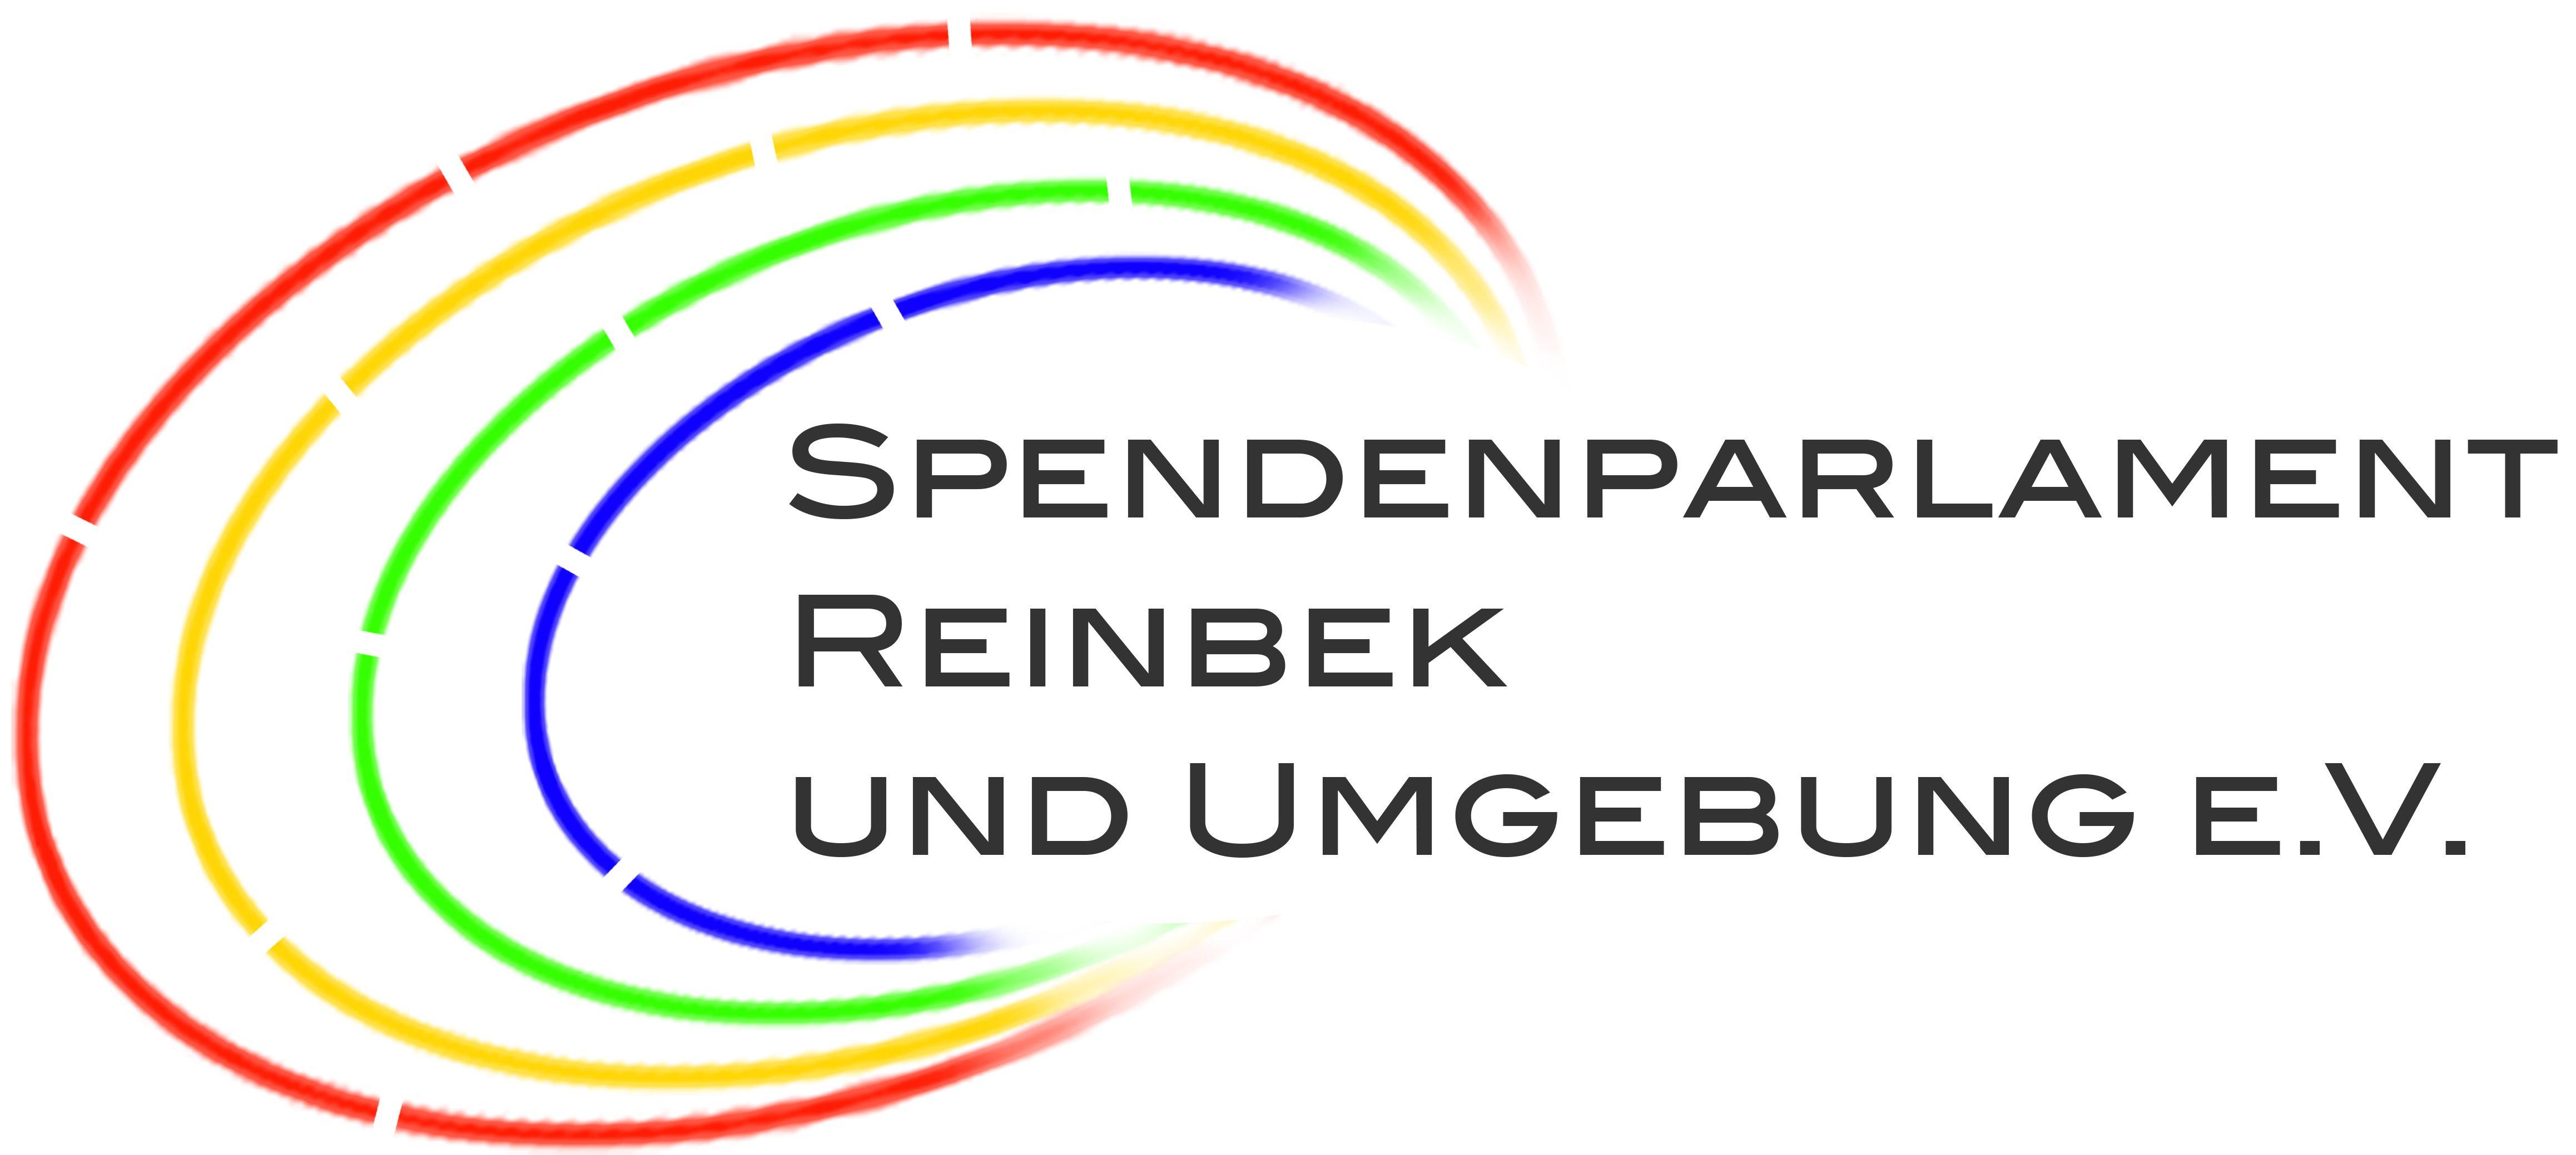 Spendenparlament Reinbek und Umgebung